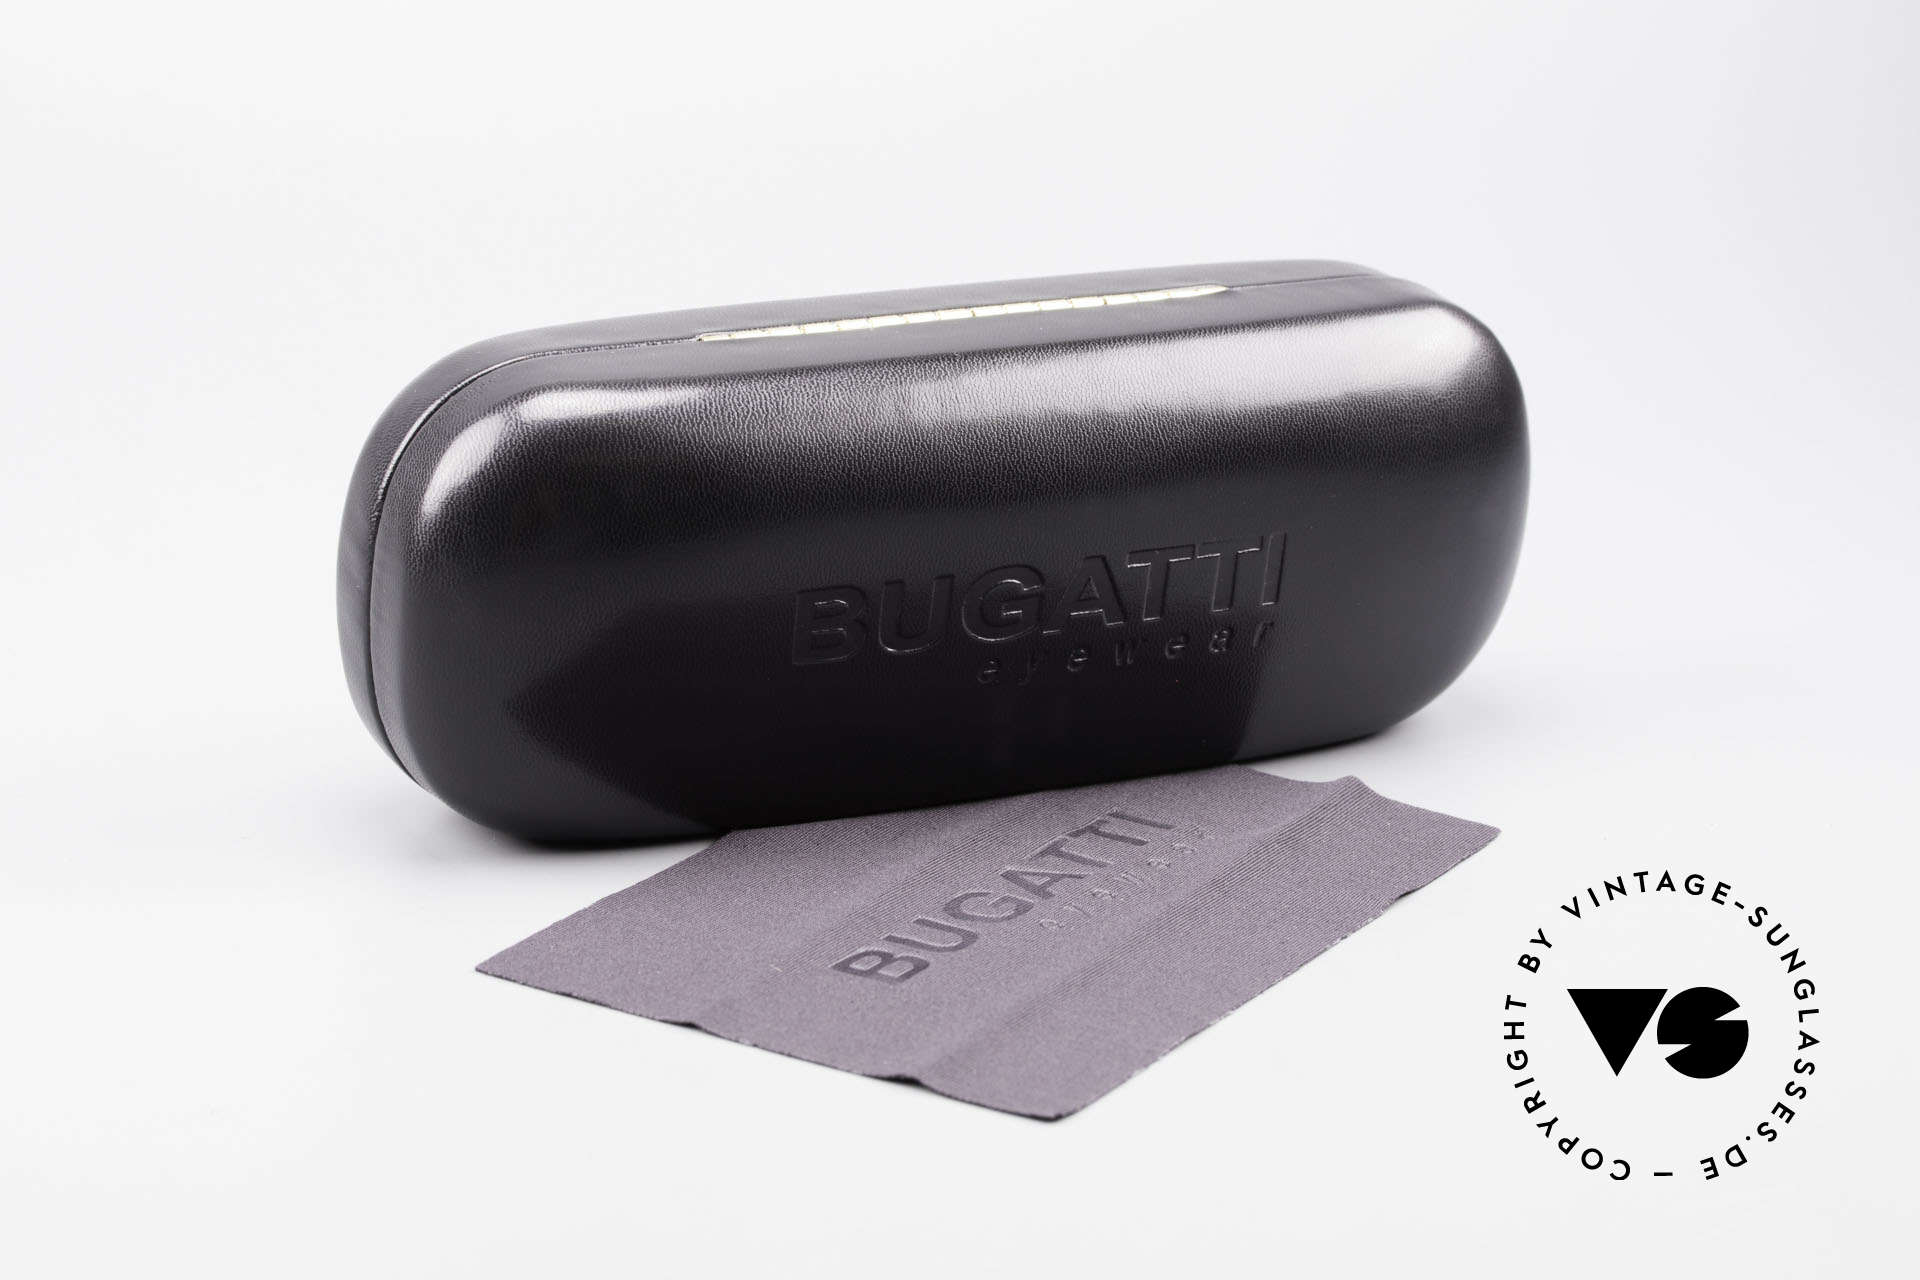 Bugatti 470 Limited Luxury Eyeglasses Men, Size: medium, Made for Men